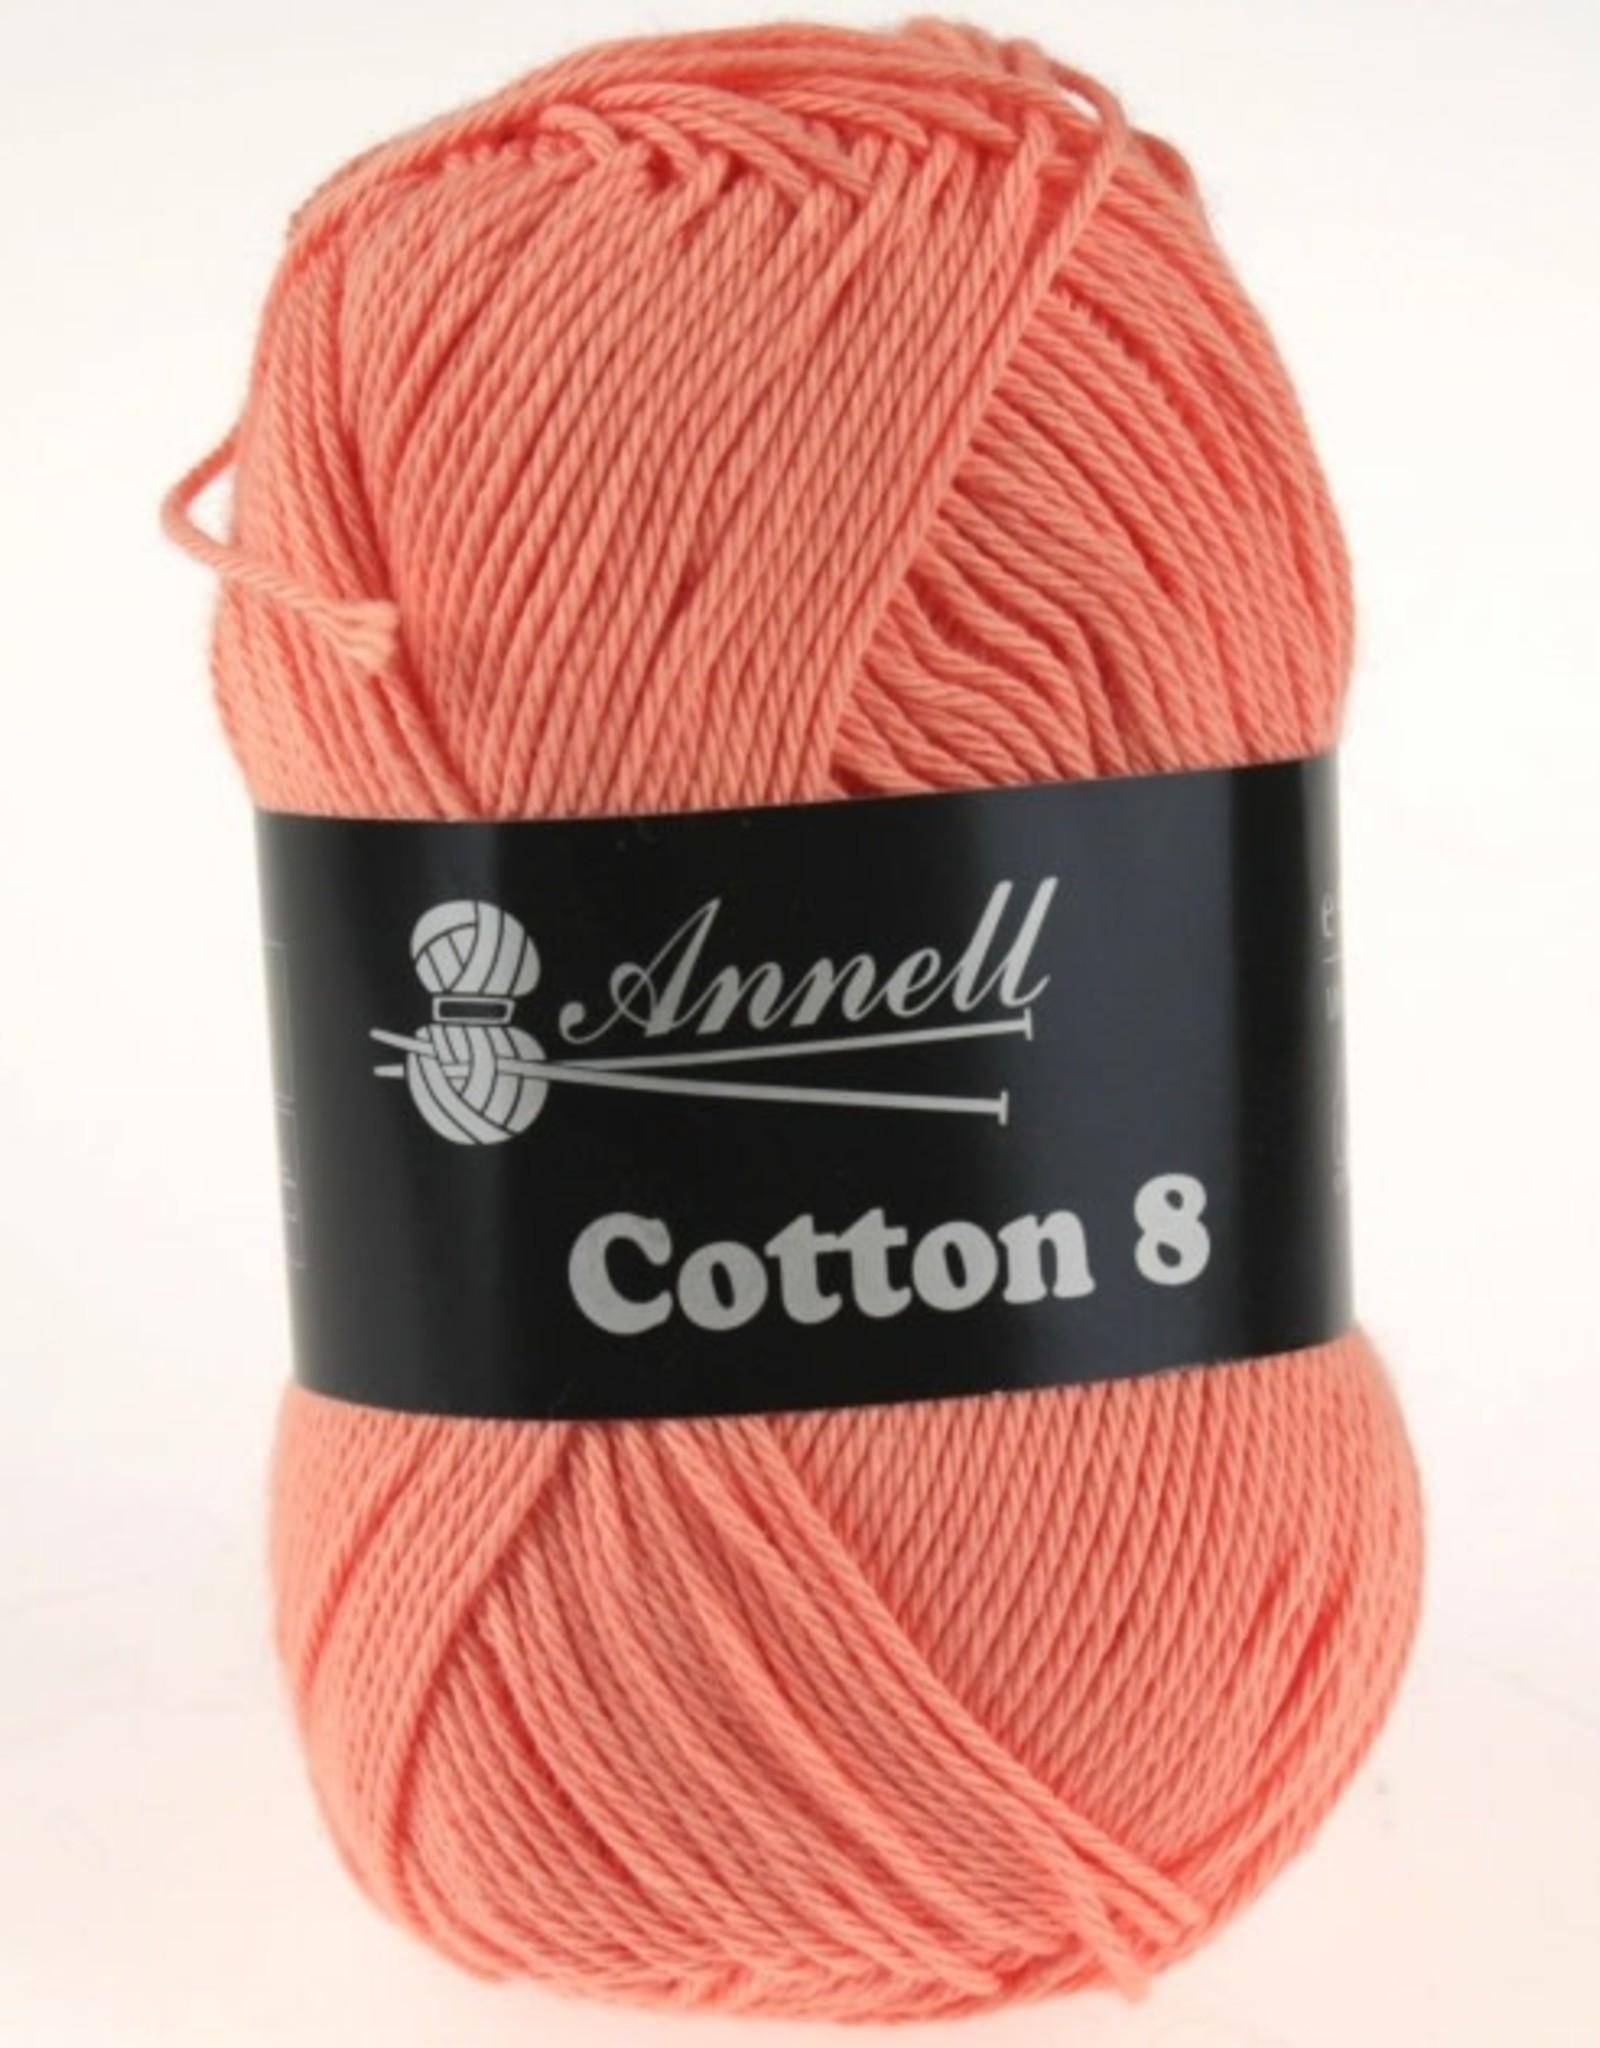 Annell Annell Cotton 8 68